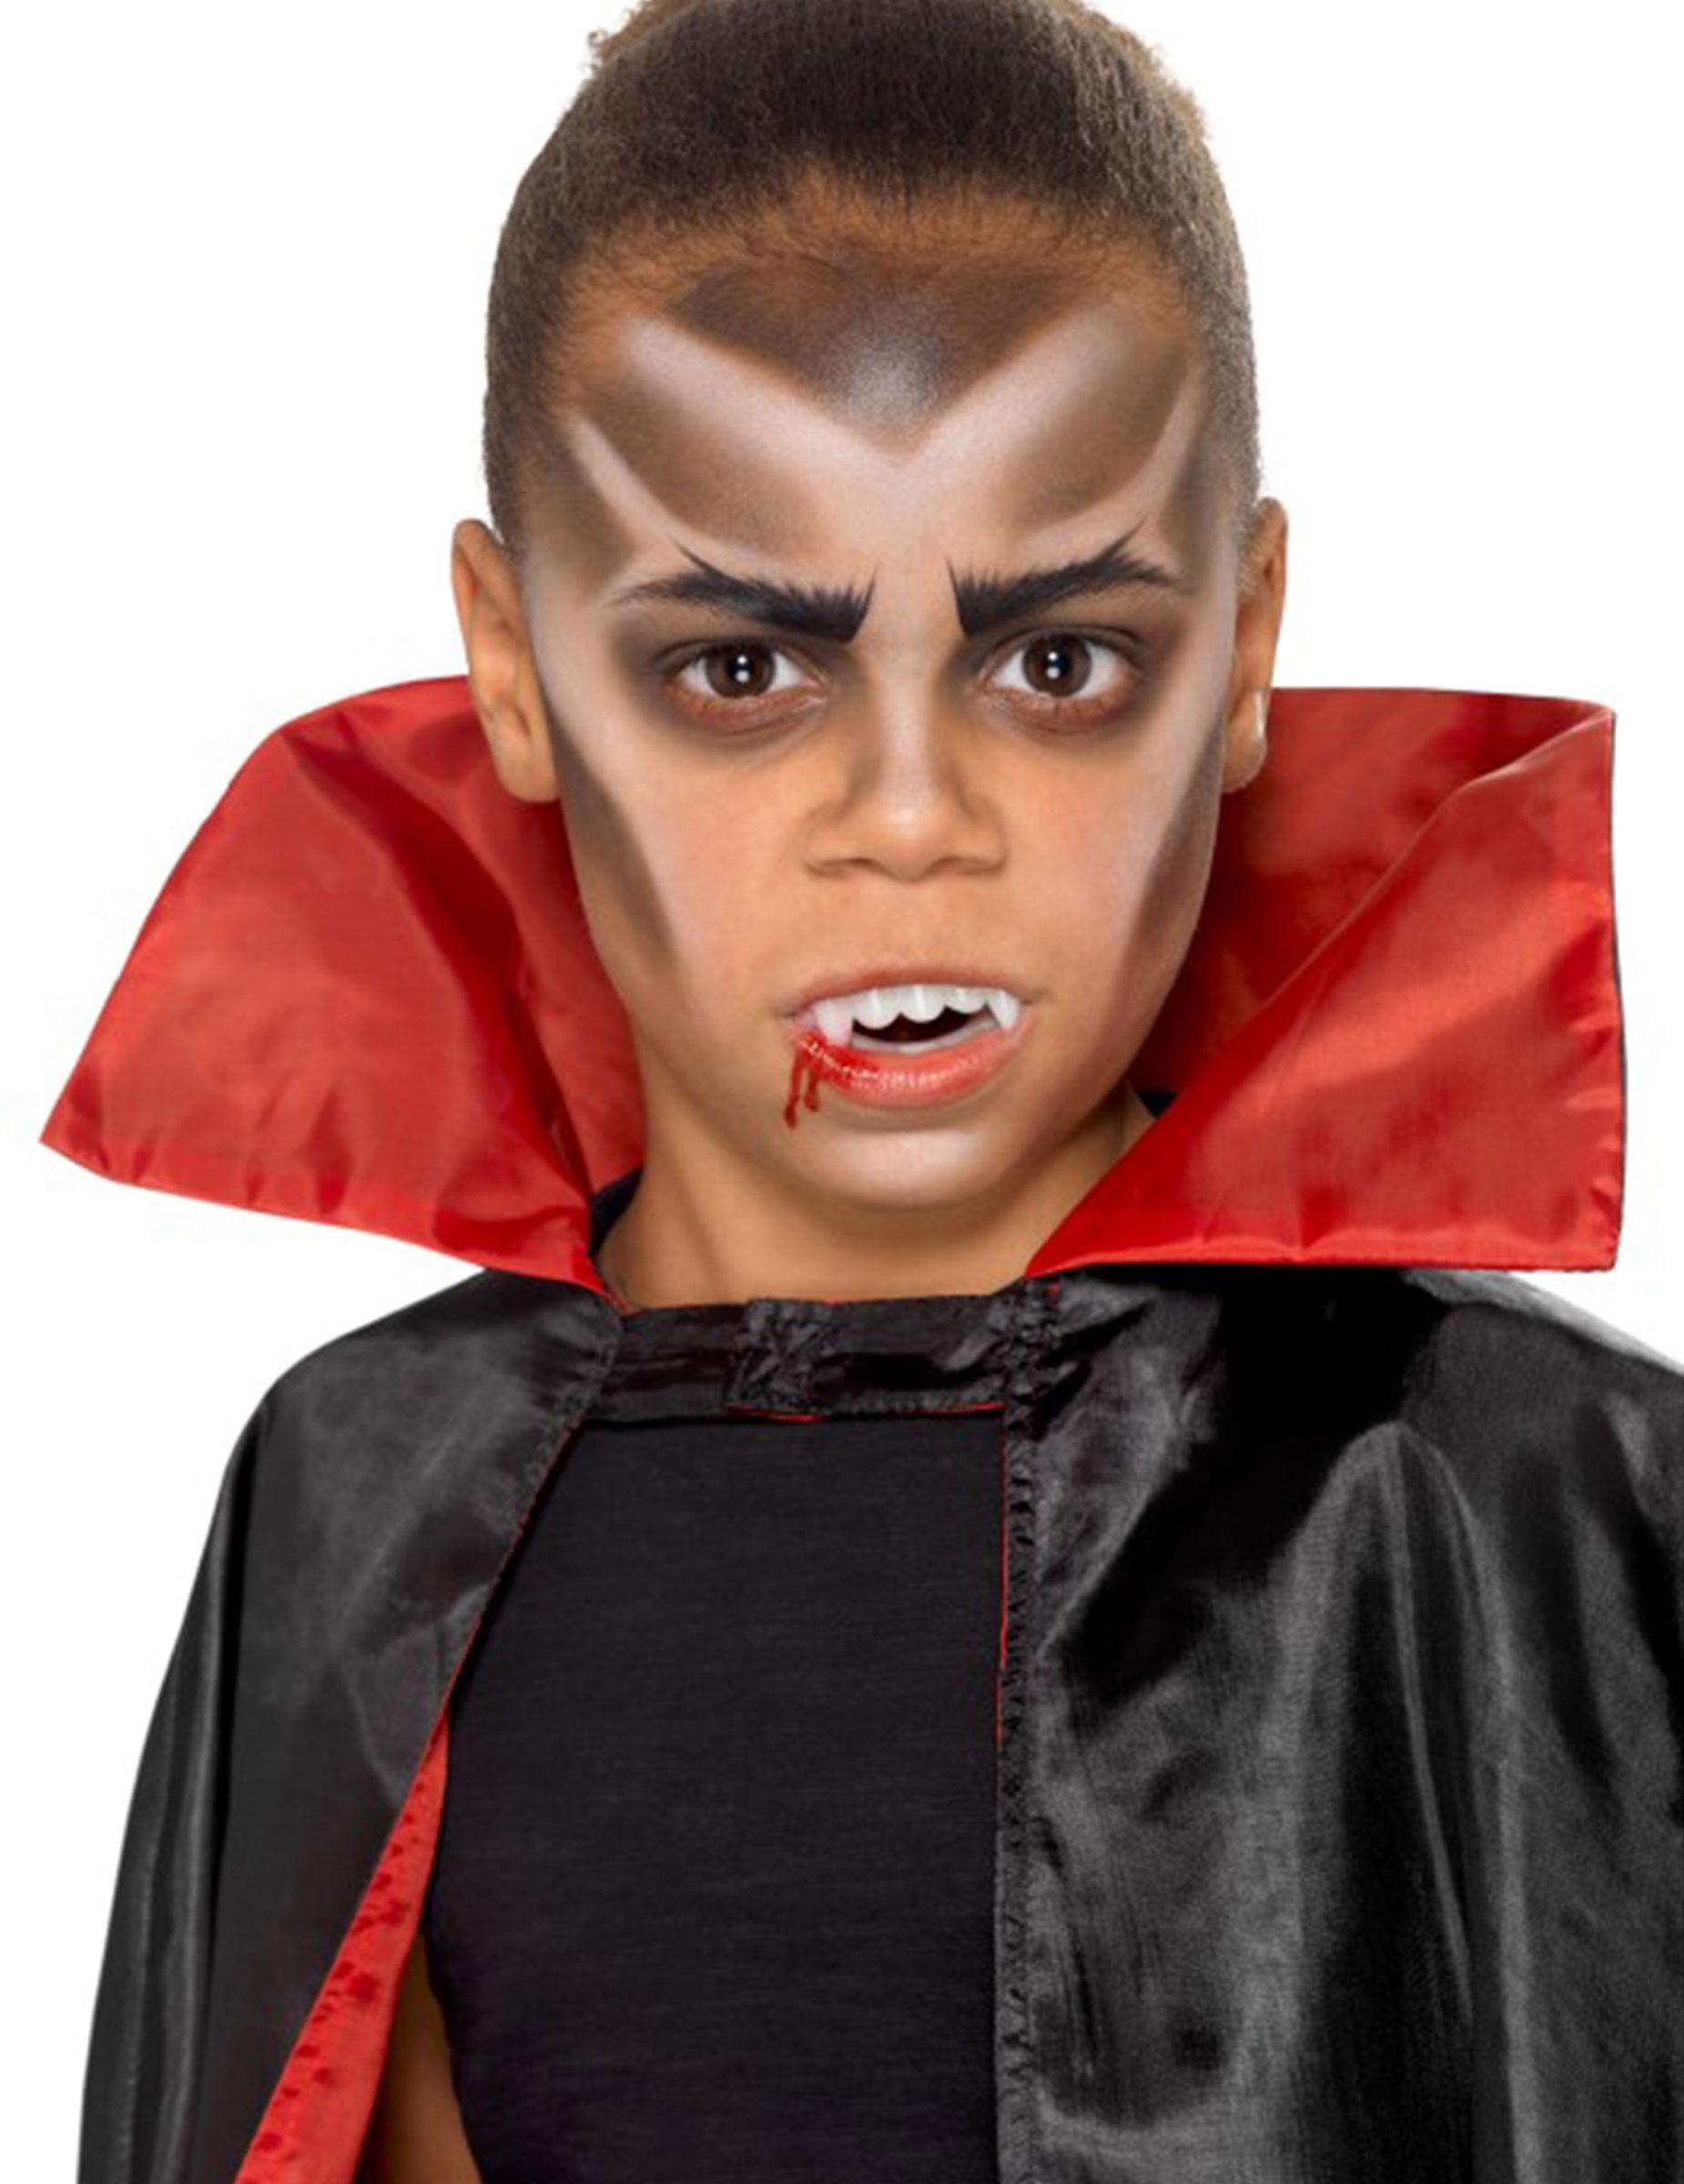 vampir schmink set f r kinder halloween 6 teilig schwarz weiss schminke und g nstige. Black Bedroom Furniture Sets. Home Design Ideas